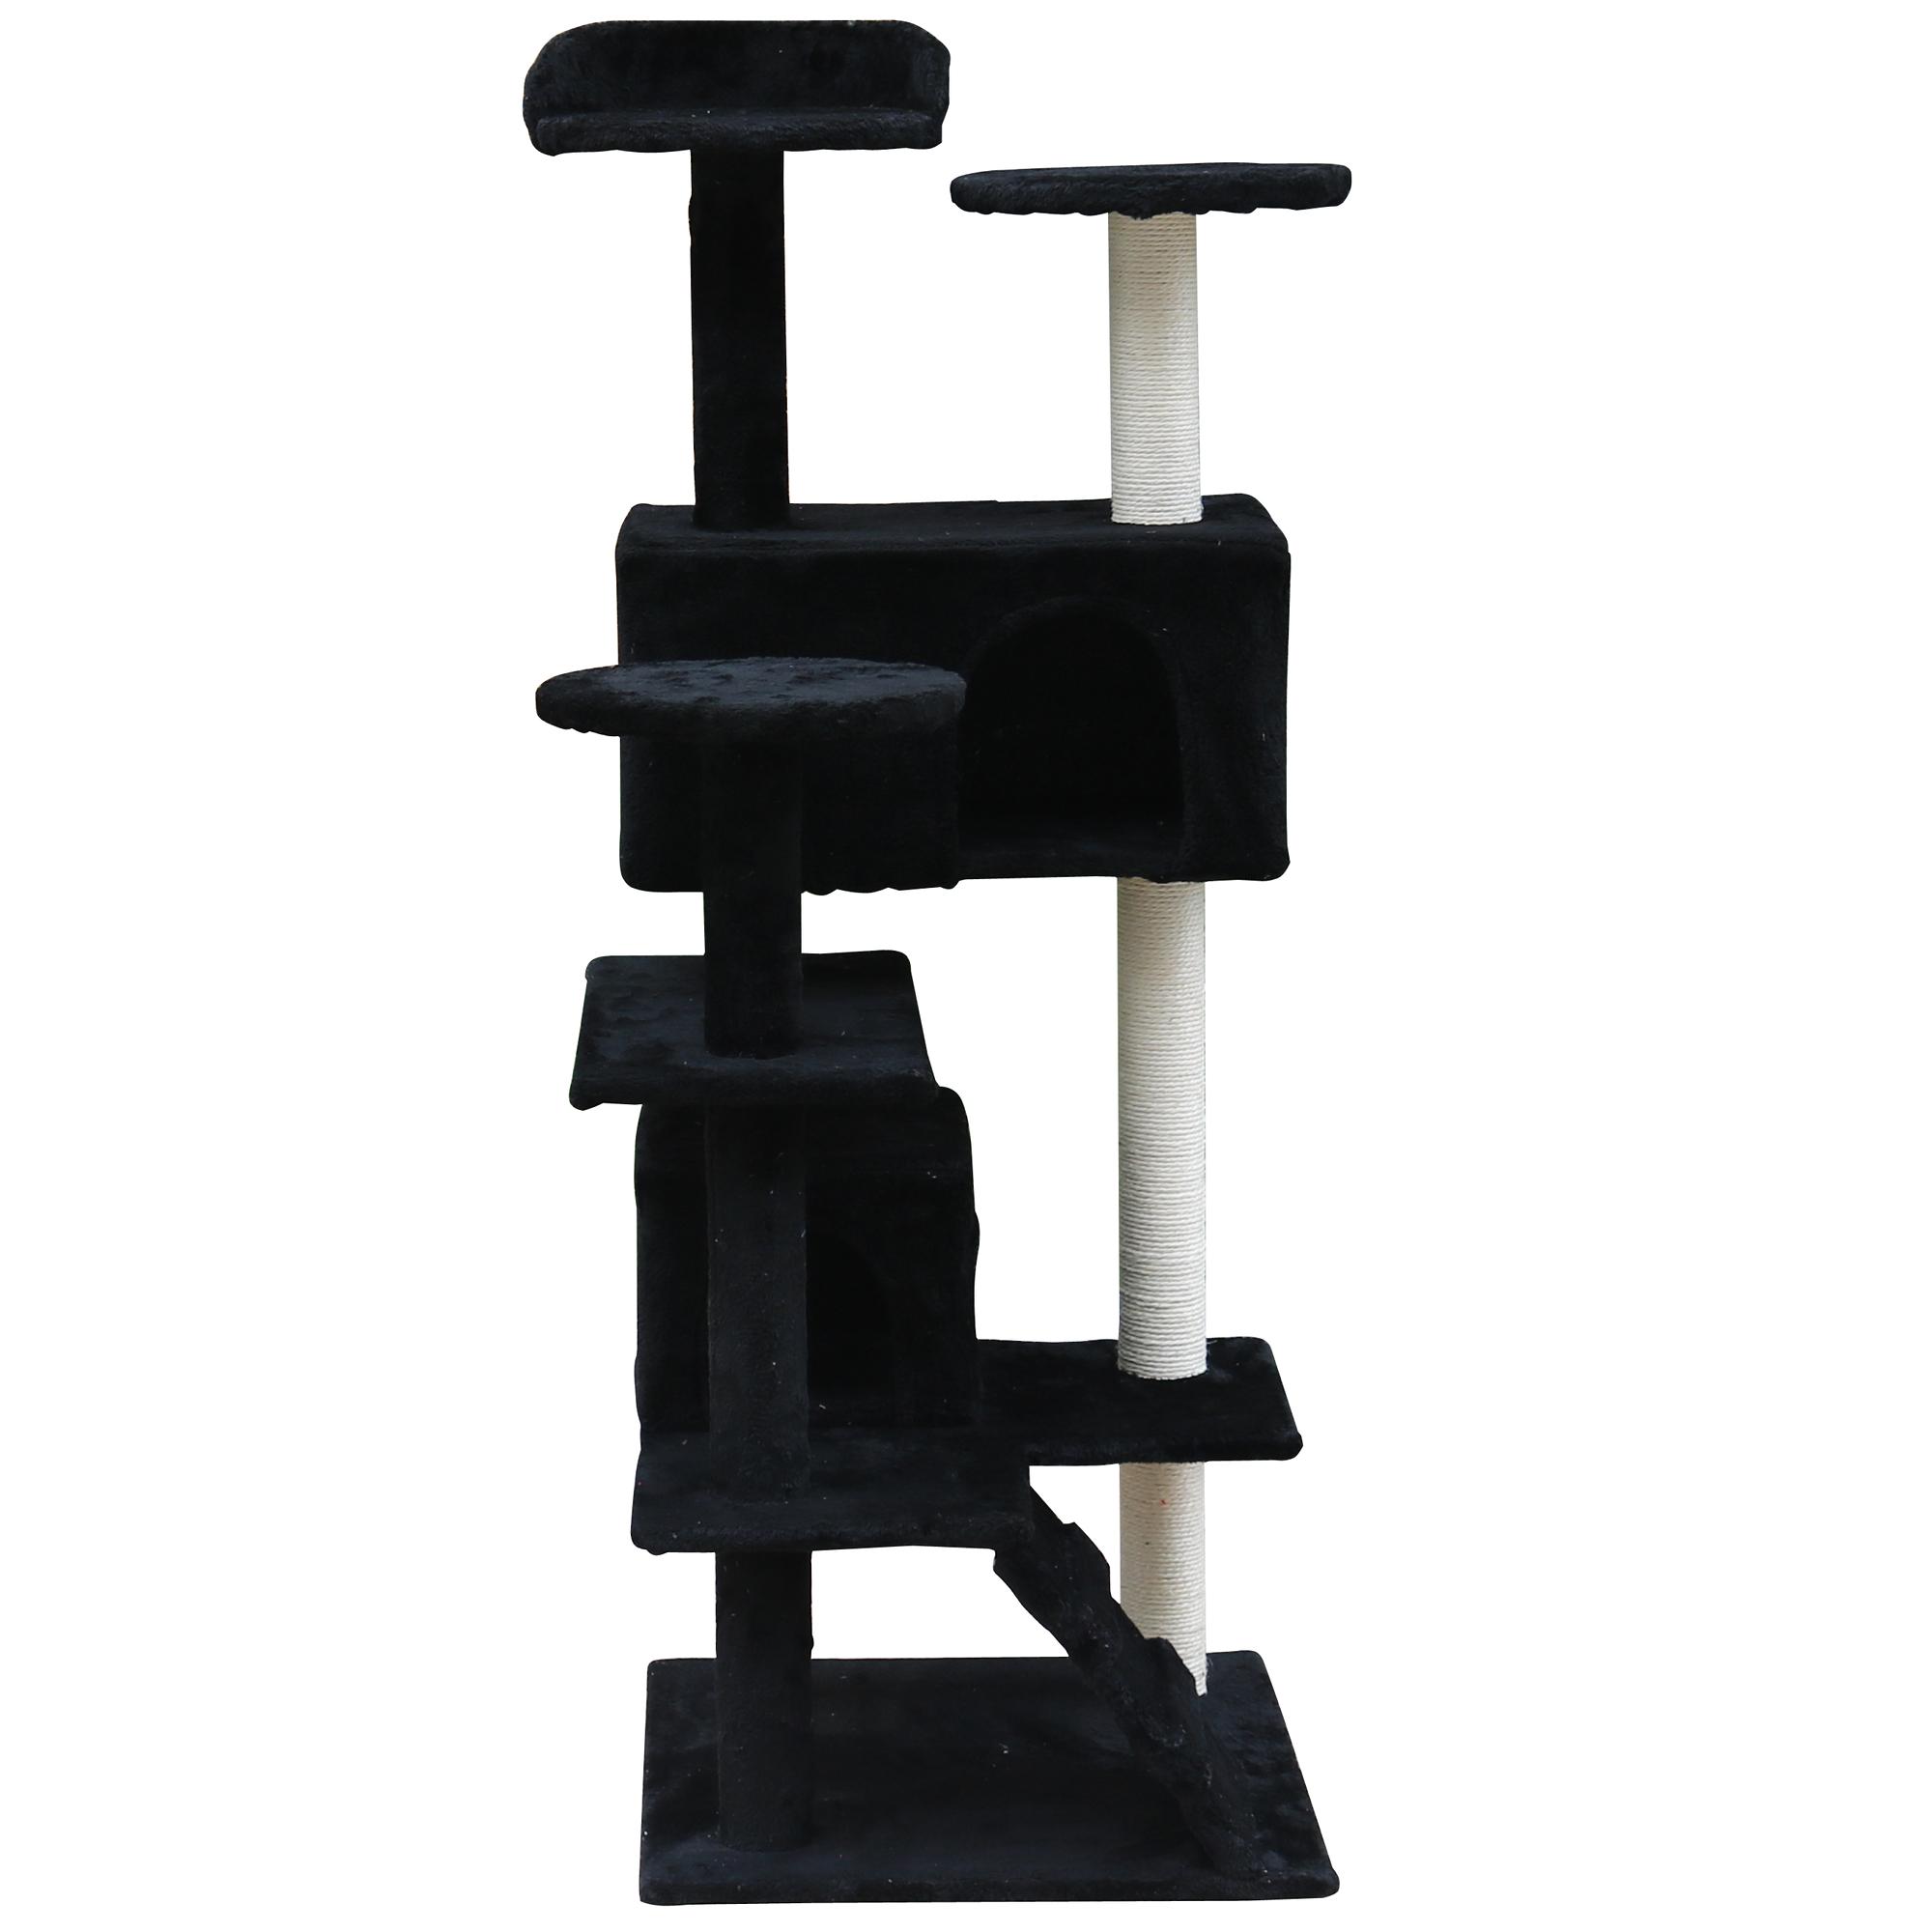 katzenkratzbaum katzenbaum kletterbaum kratzbaum baum f r katzen sisal 132cm ebay. Black Bedroom Furniture Sets. Home Design Ideas